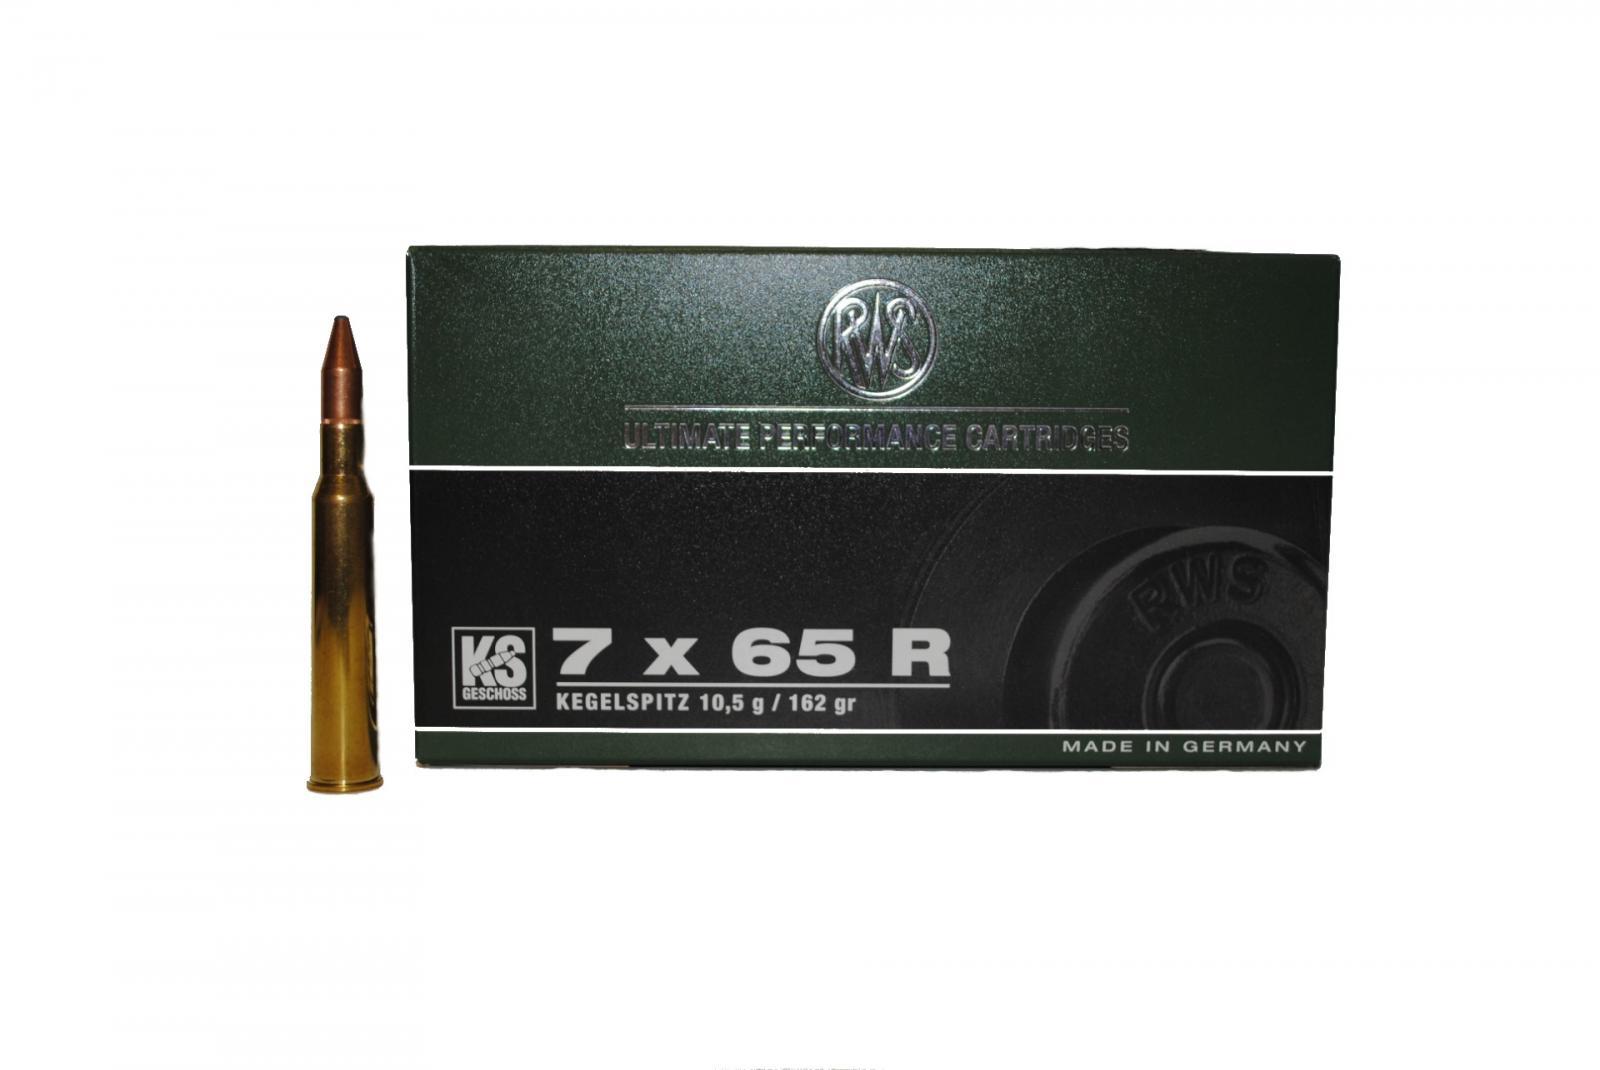 Boite de 20 cartouches RWS KS 162 GRS calibre 7 x 65R  R2118483